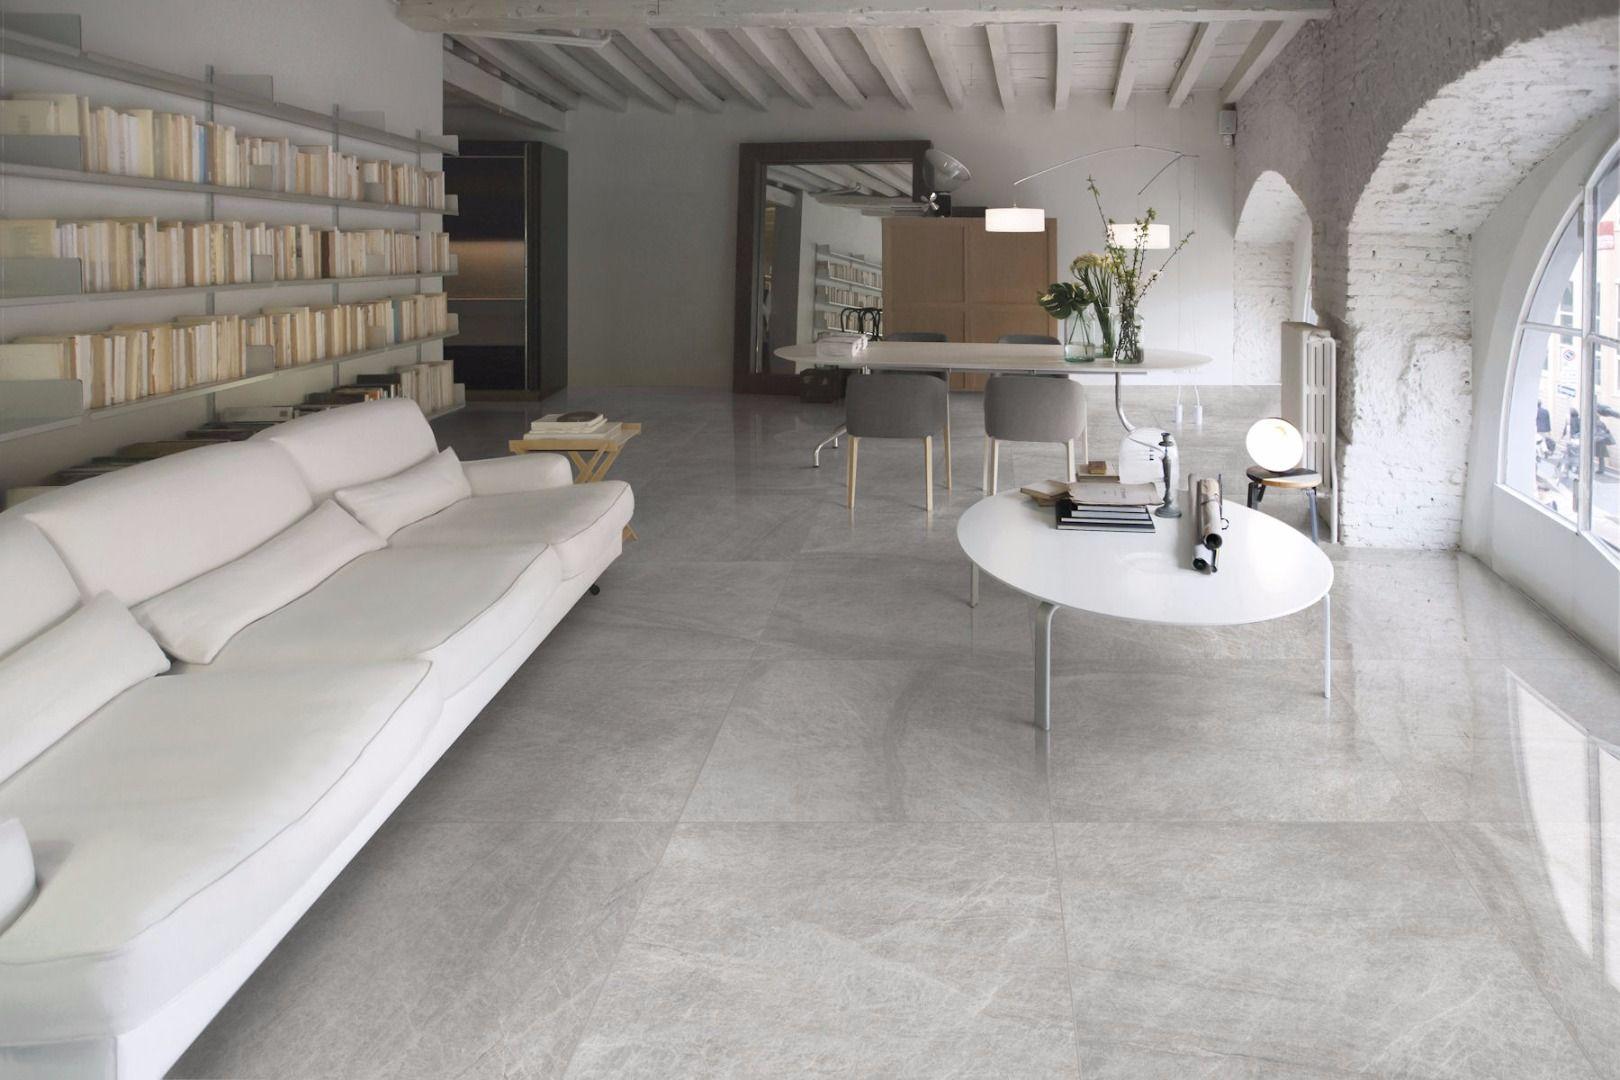 Mimica Grey Emperador Gloss Porcelain Living Room Tiles Grey Marble Floor Grey Flooring Living Room #stone #floor #living #room